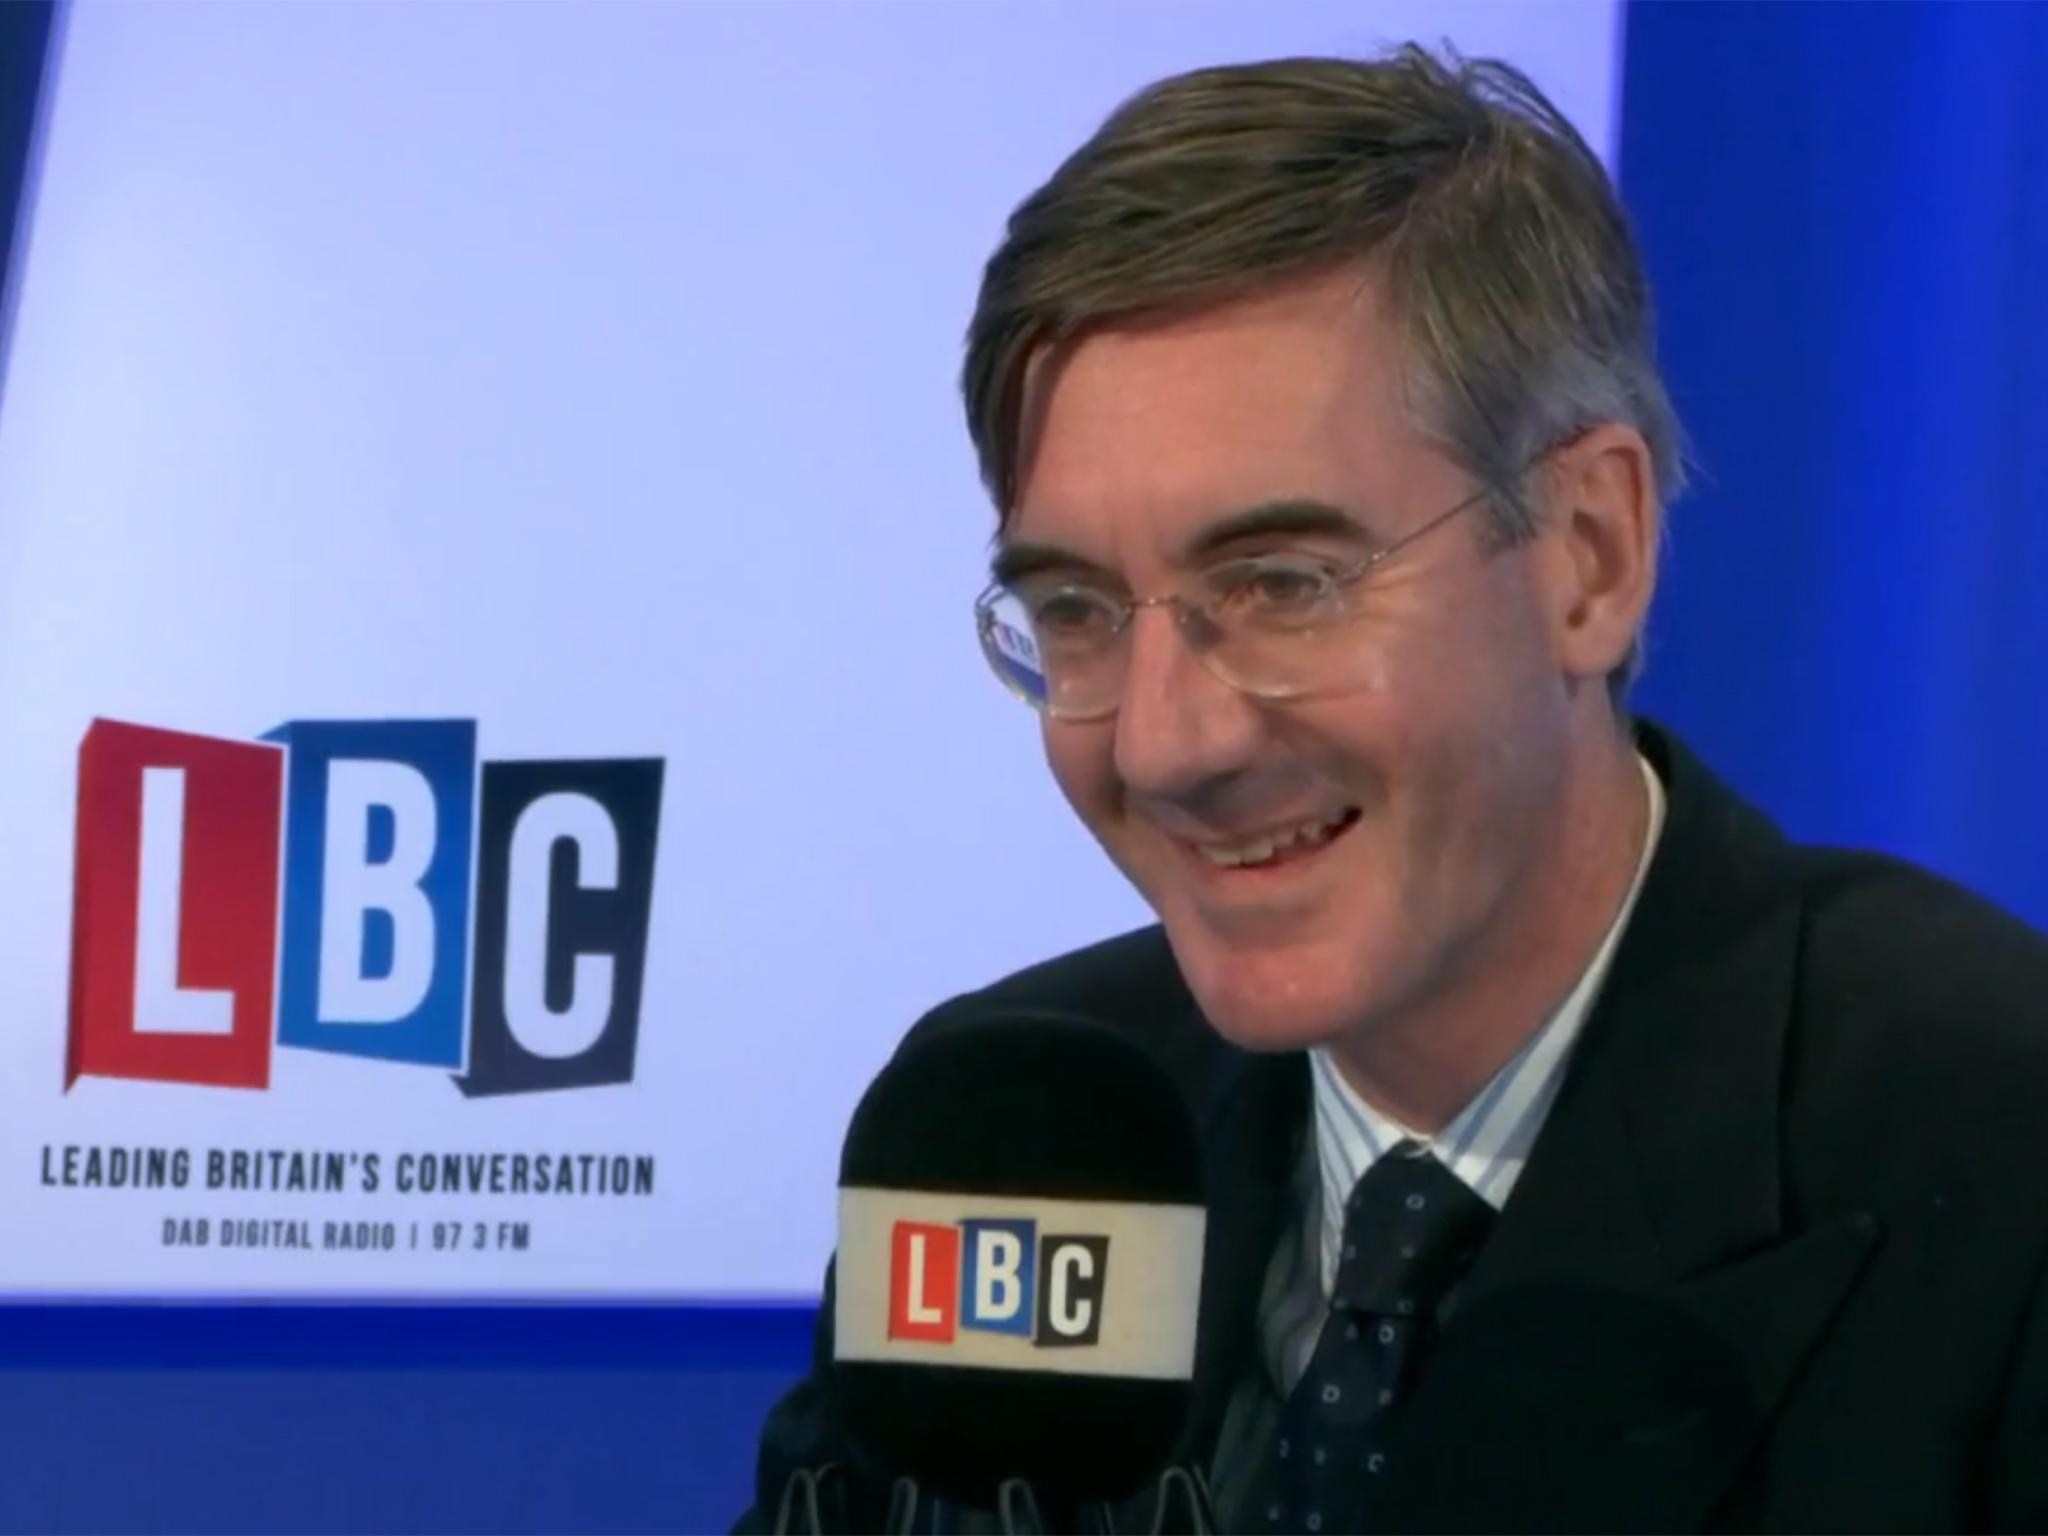 Jacob Rees Mogg says UK food bank use is 'rather uplifting'